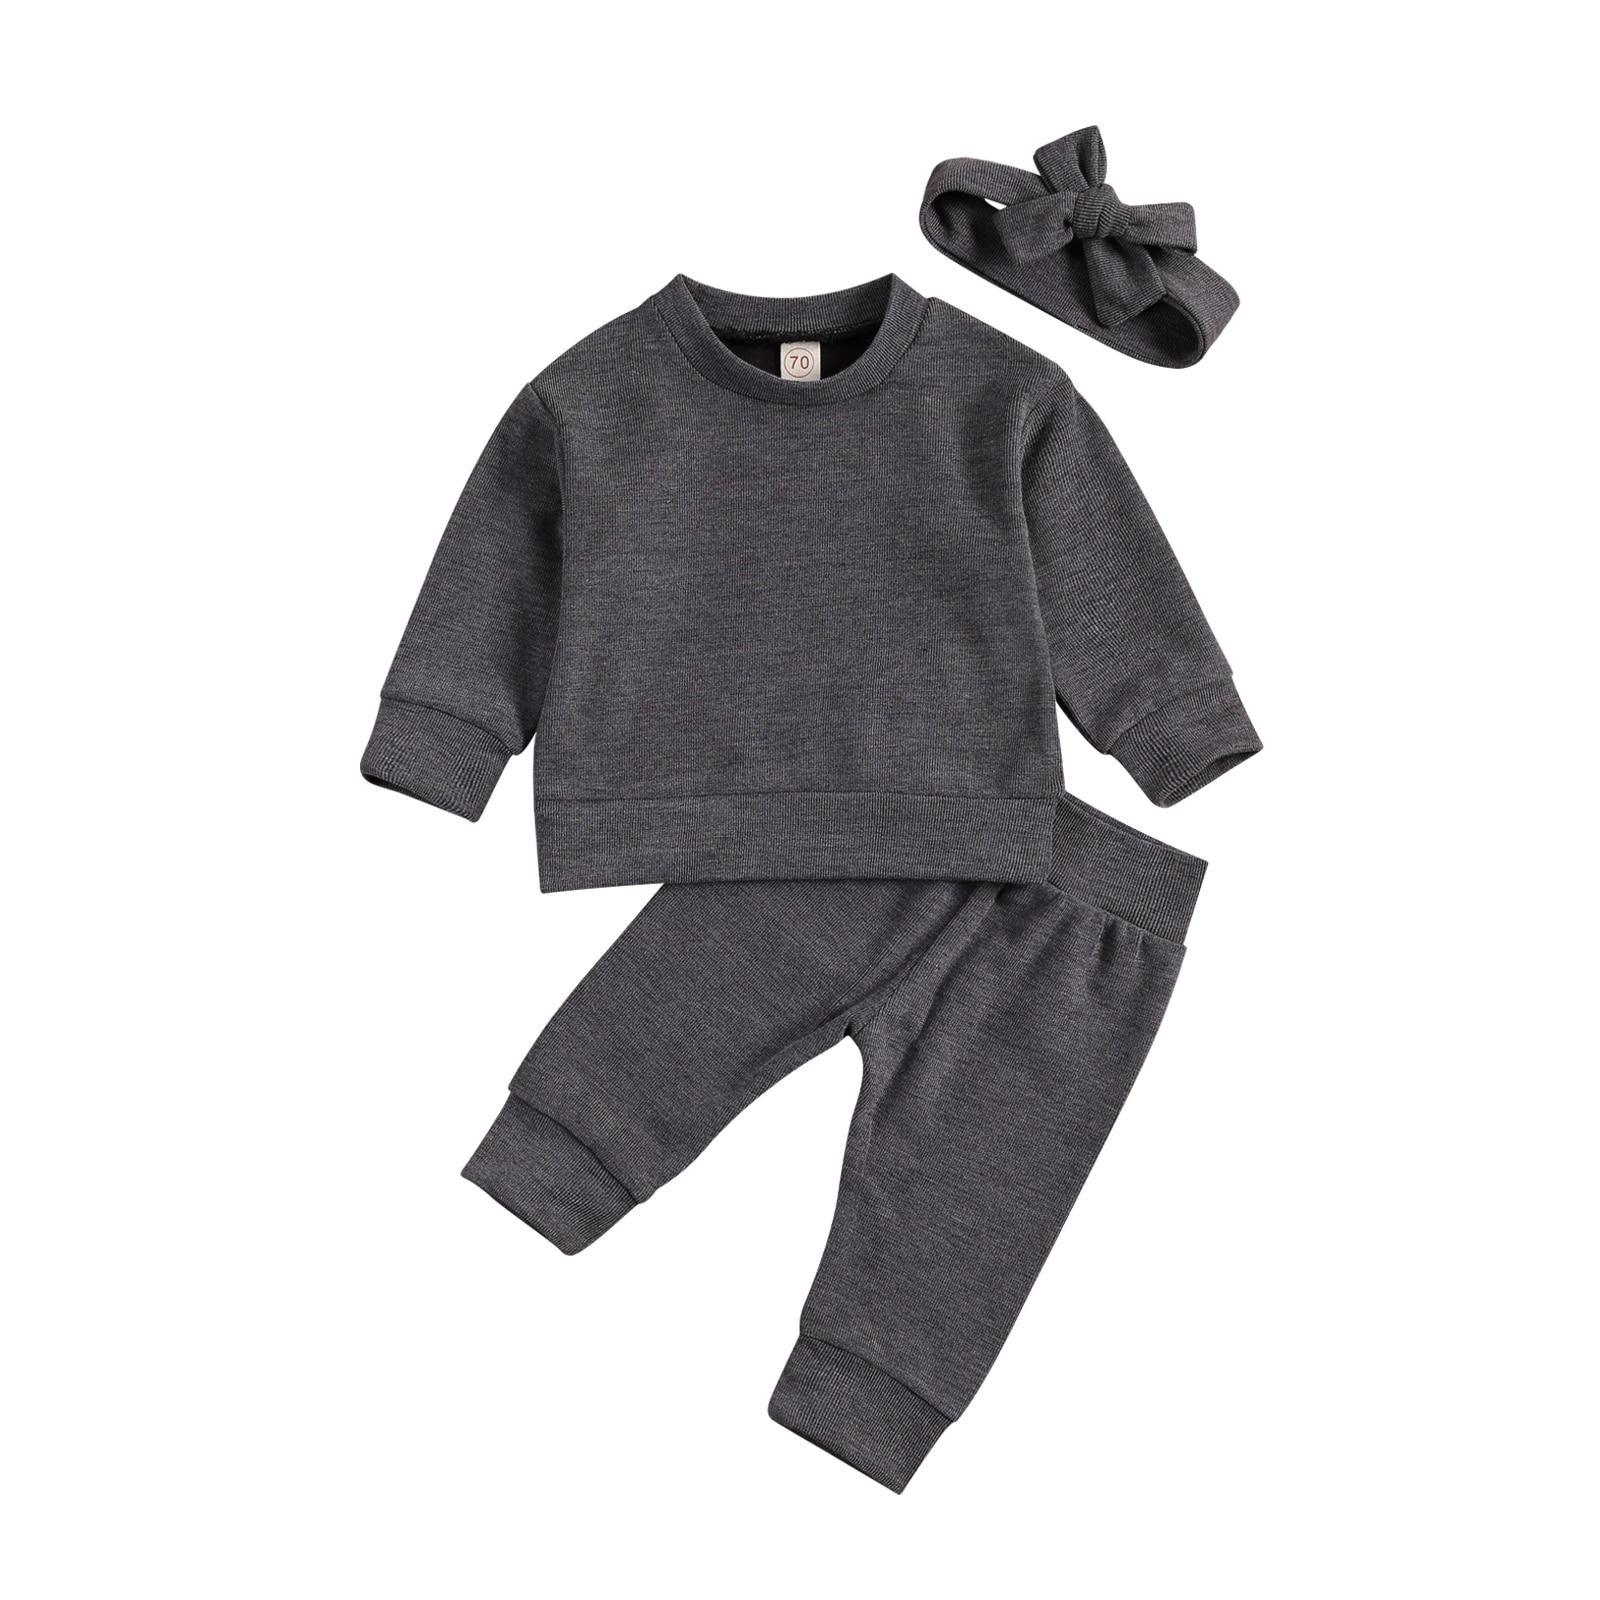 Купить с кэшбэком Toddler Baby Boys Girls Clothes Autumn Newborn Pullover Long Sleeve Tops + Pants + Headband Cotton Soft Baby Tracksuits 0-3Y